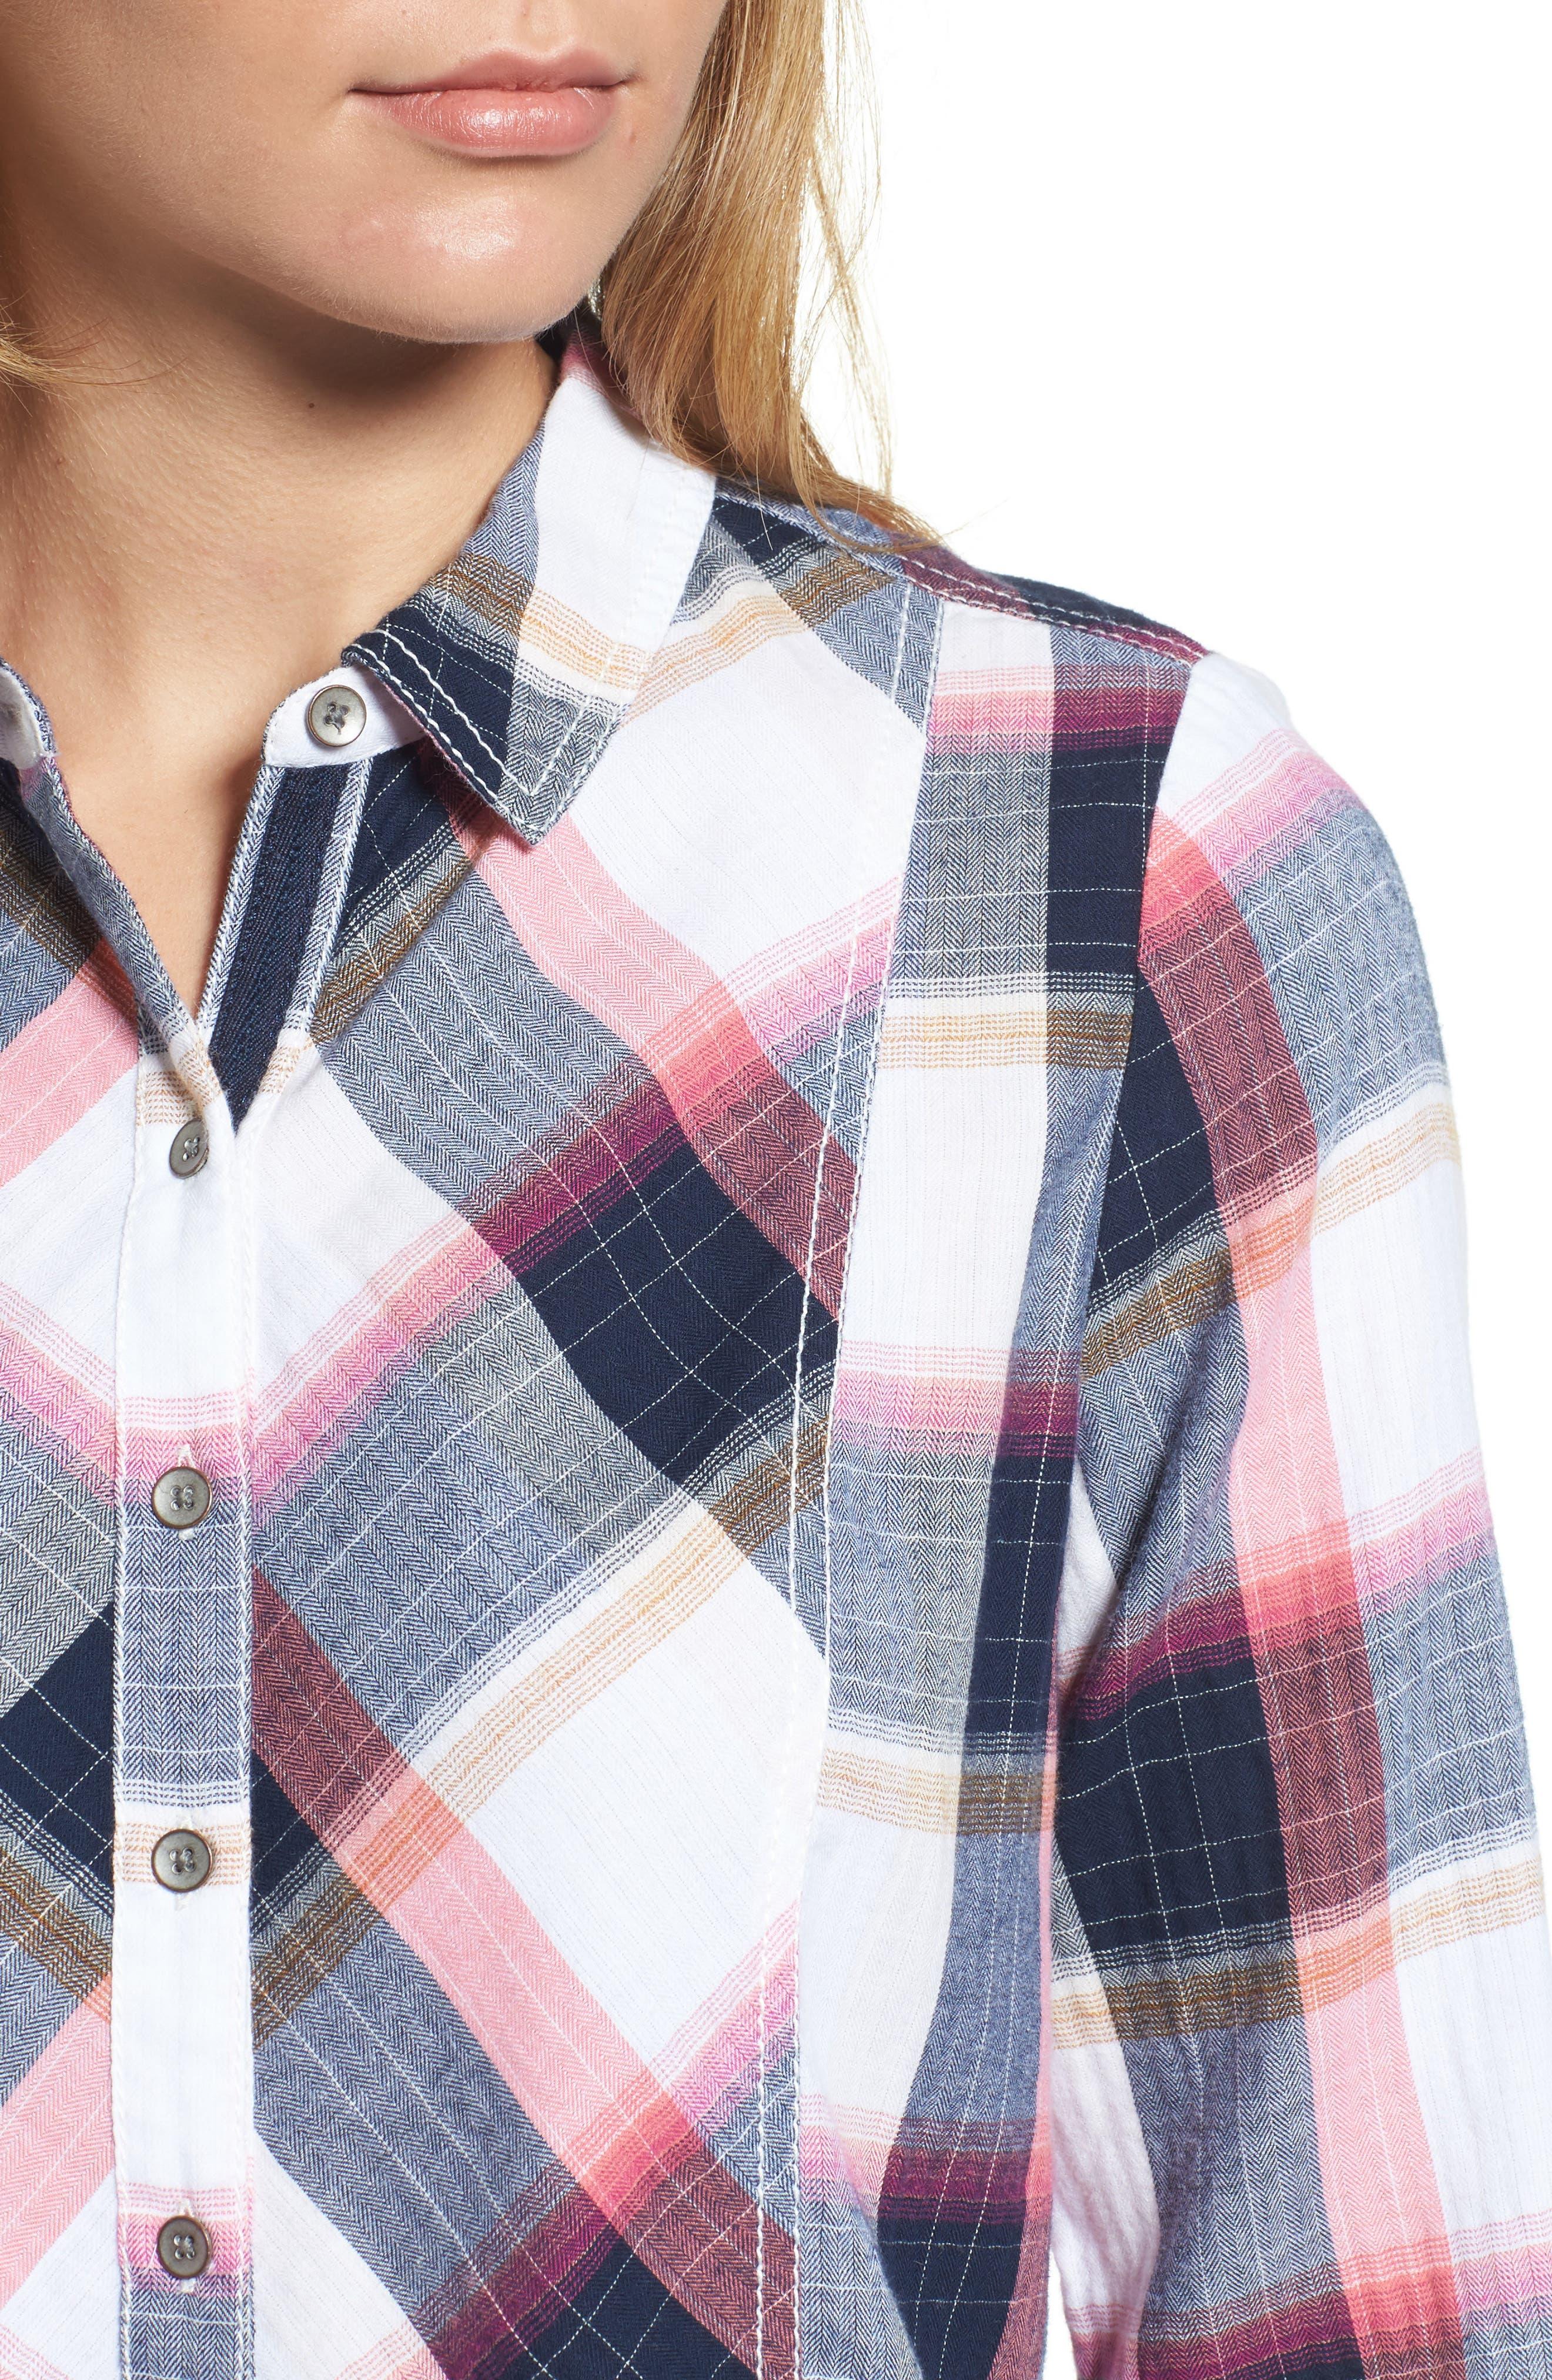 Peplum Plaid Shirt,                             Alternate thumbnail 4, color,                             Navy- Rose Plaid